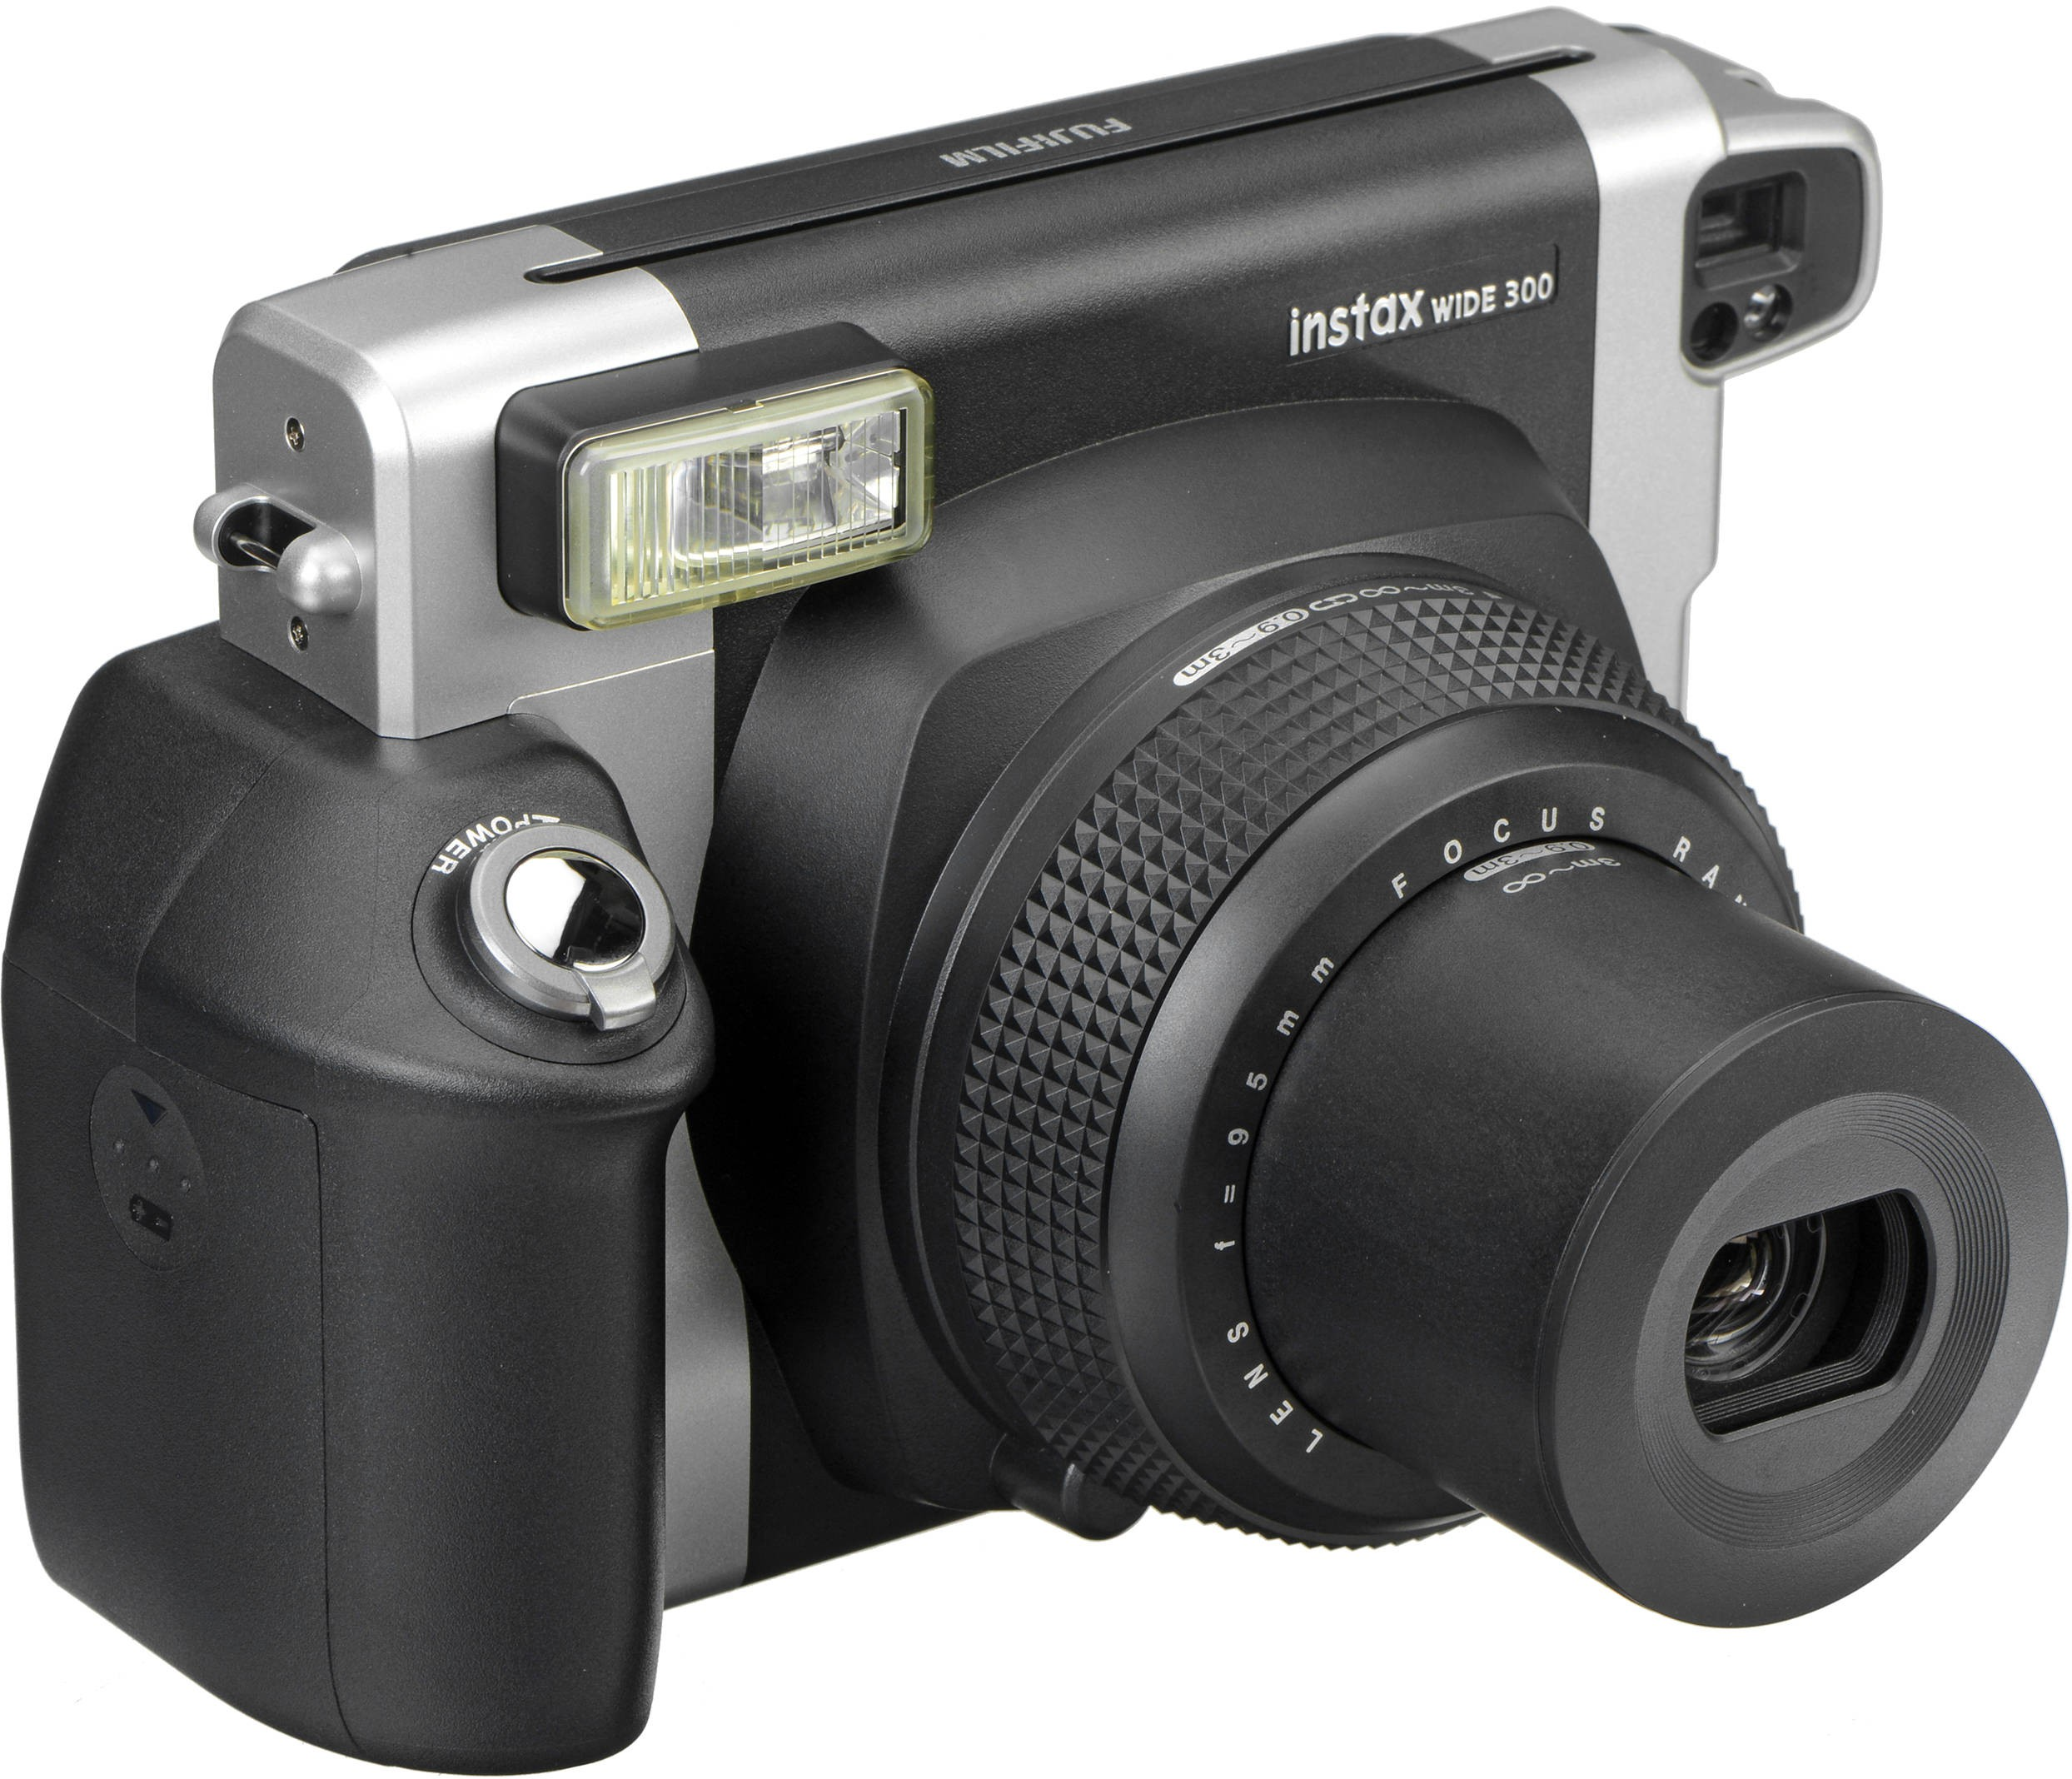 Fujifilm Instax Wide 300 4547410291735 4547410291735 Digitālā kamera